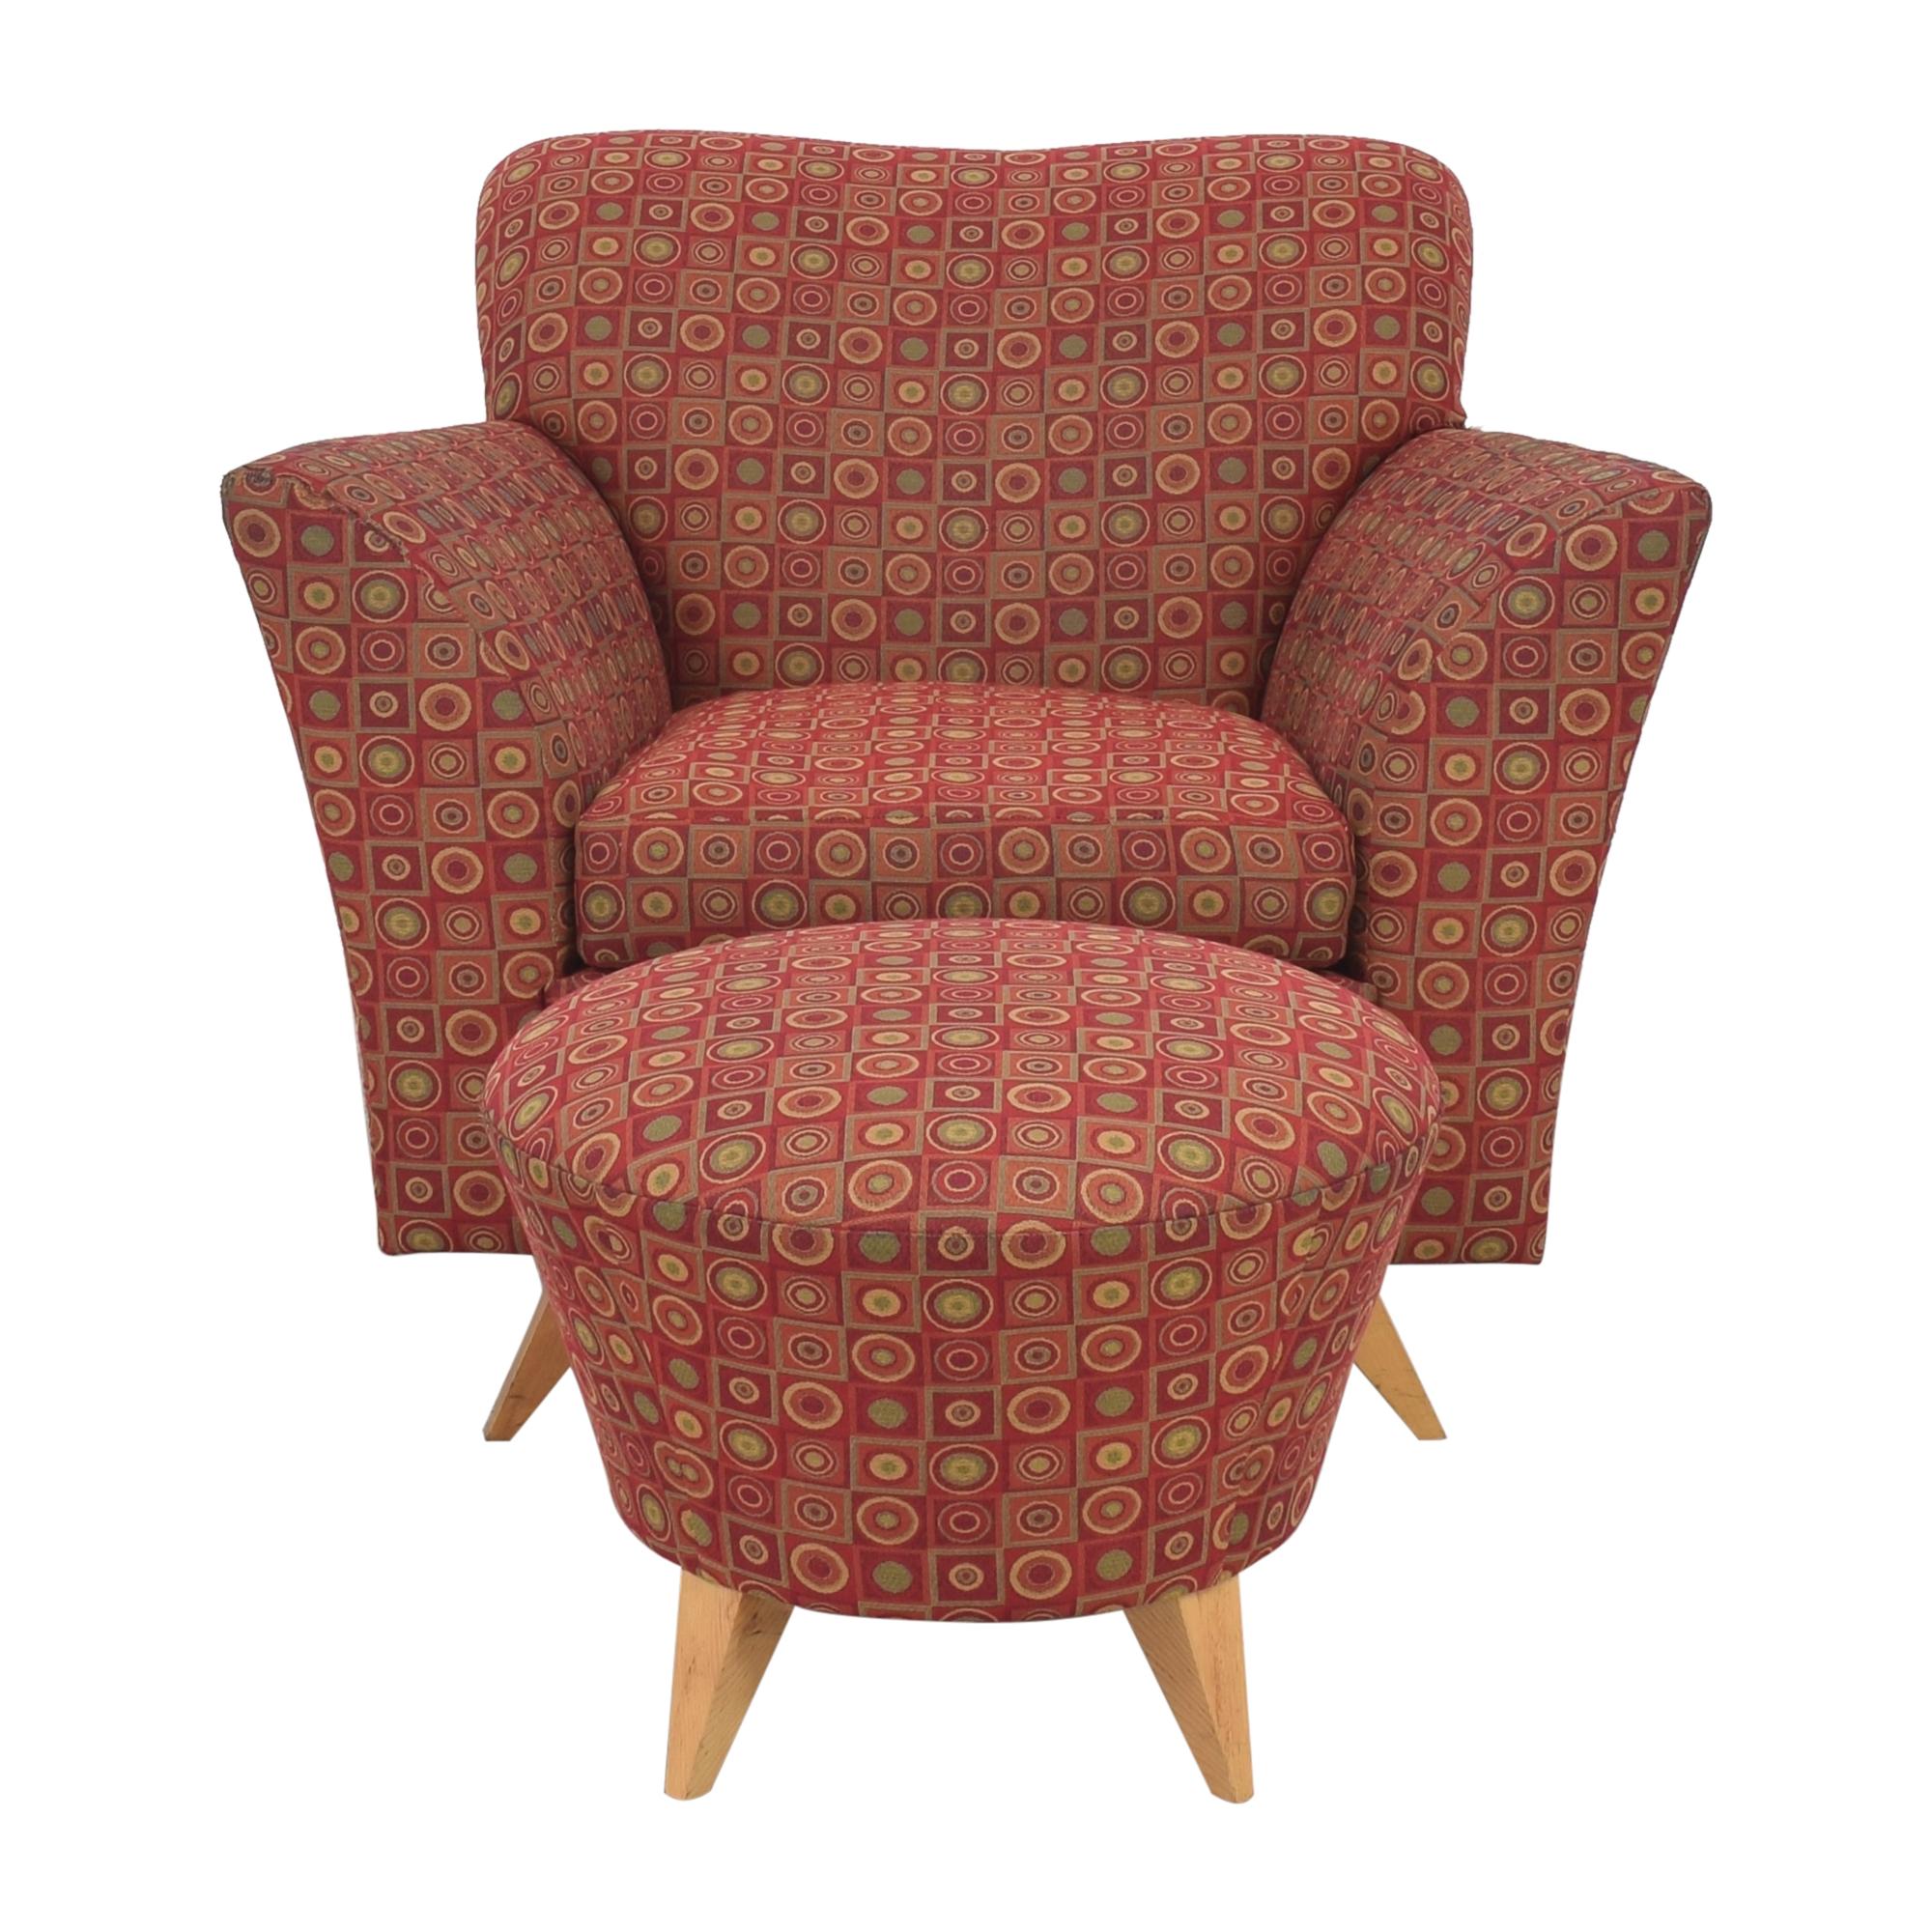 Dakota Jackson Club Chair and Ottoman / Chairs